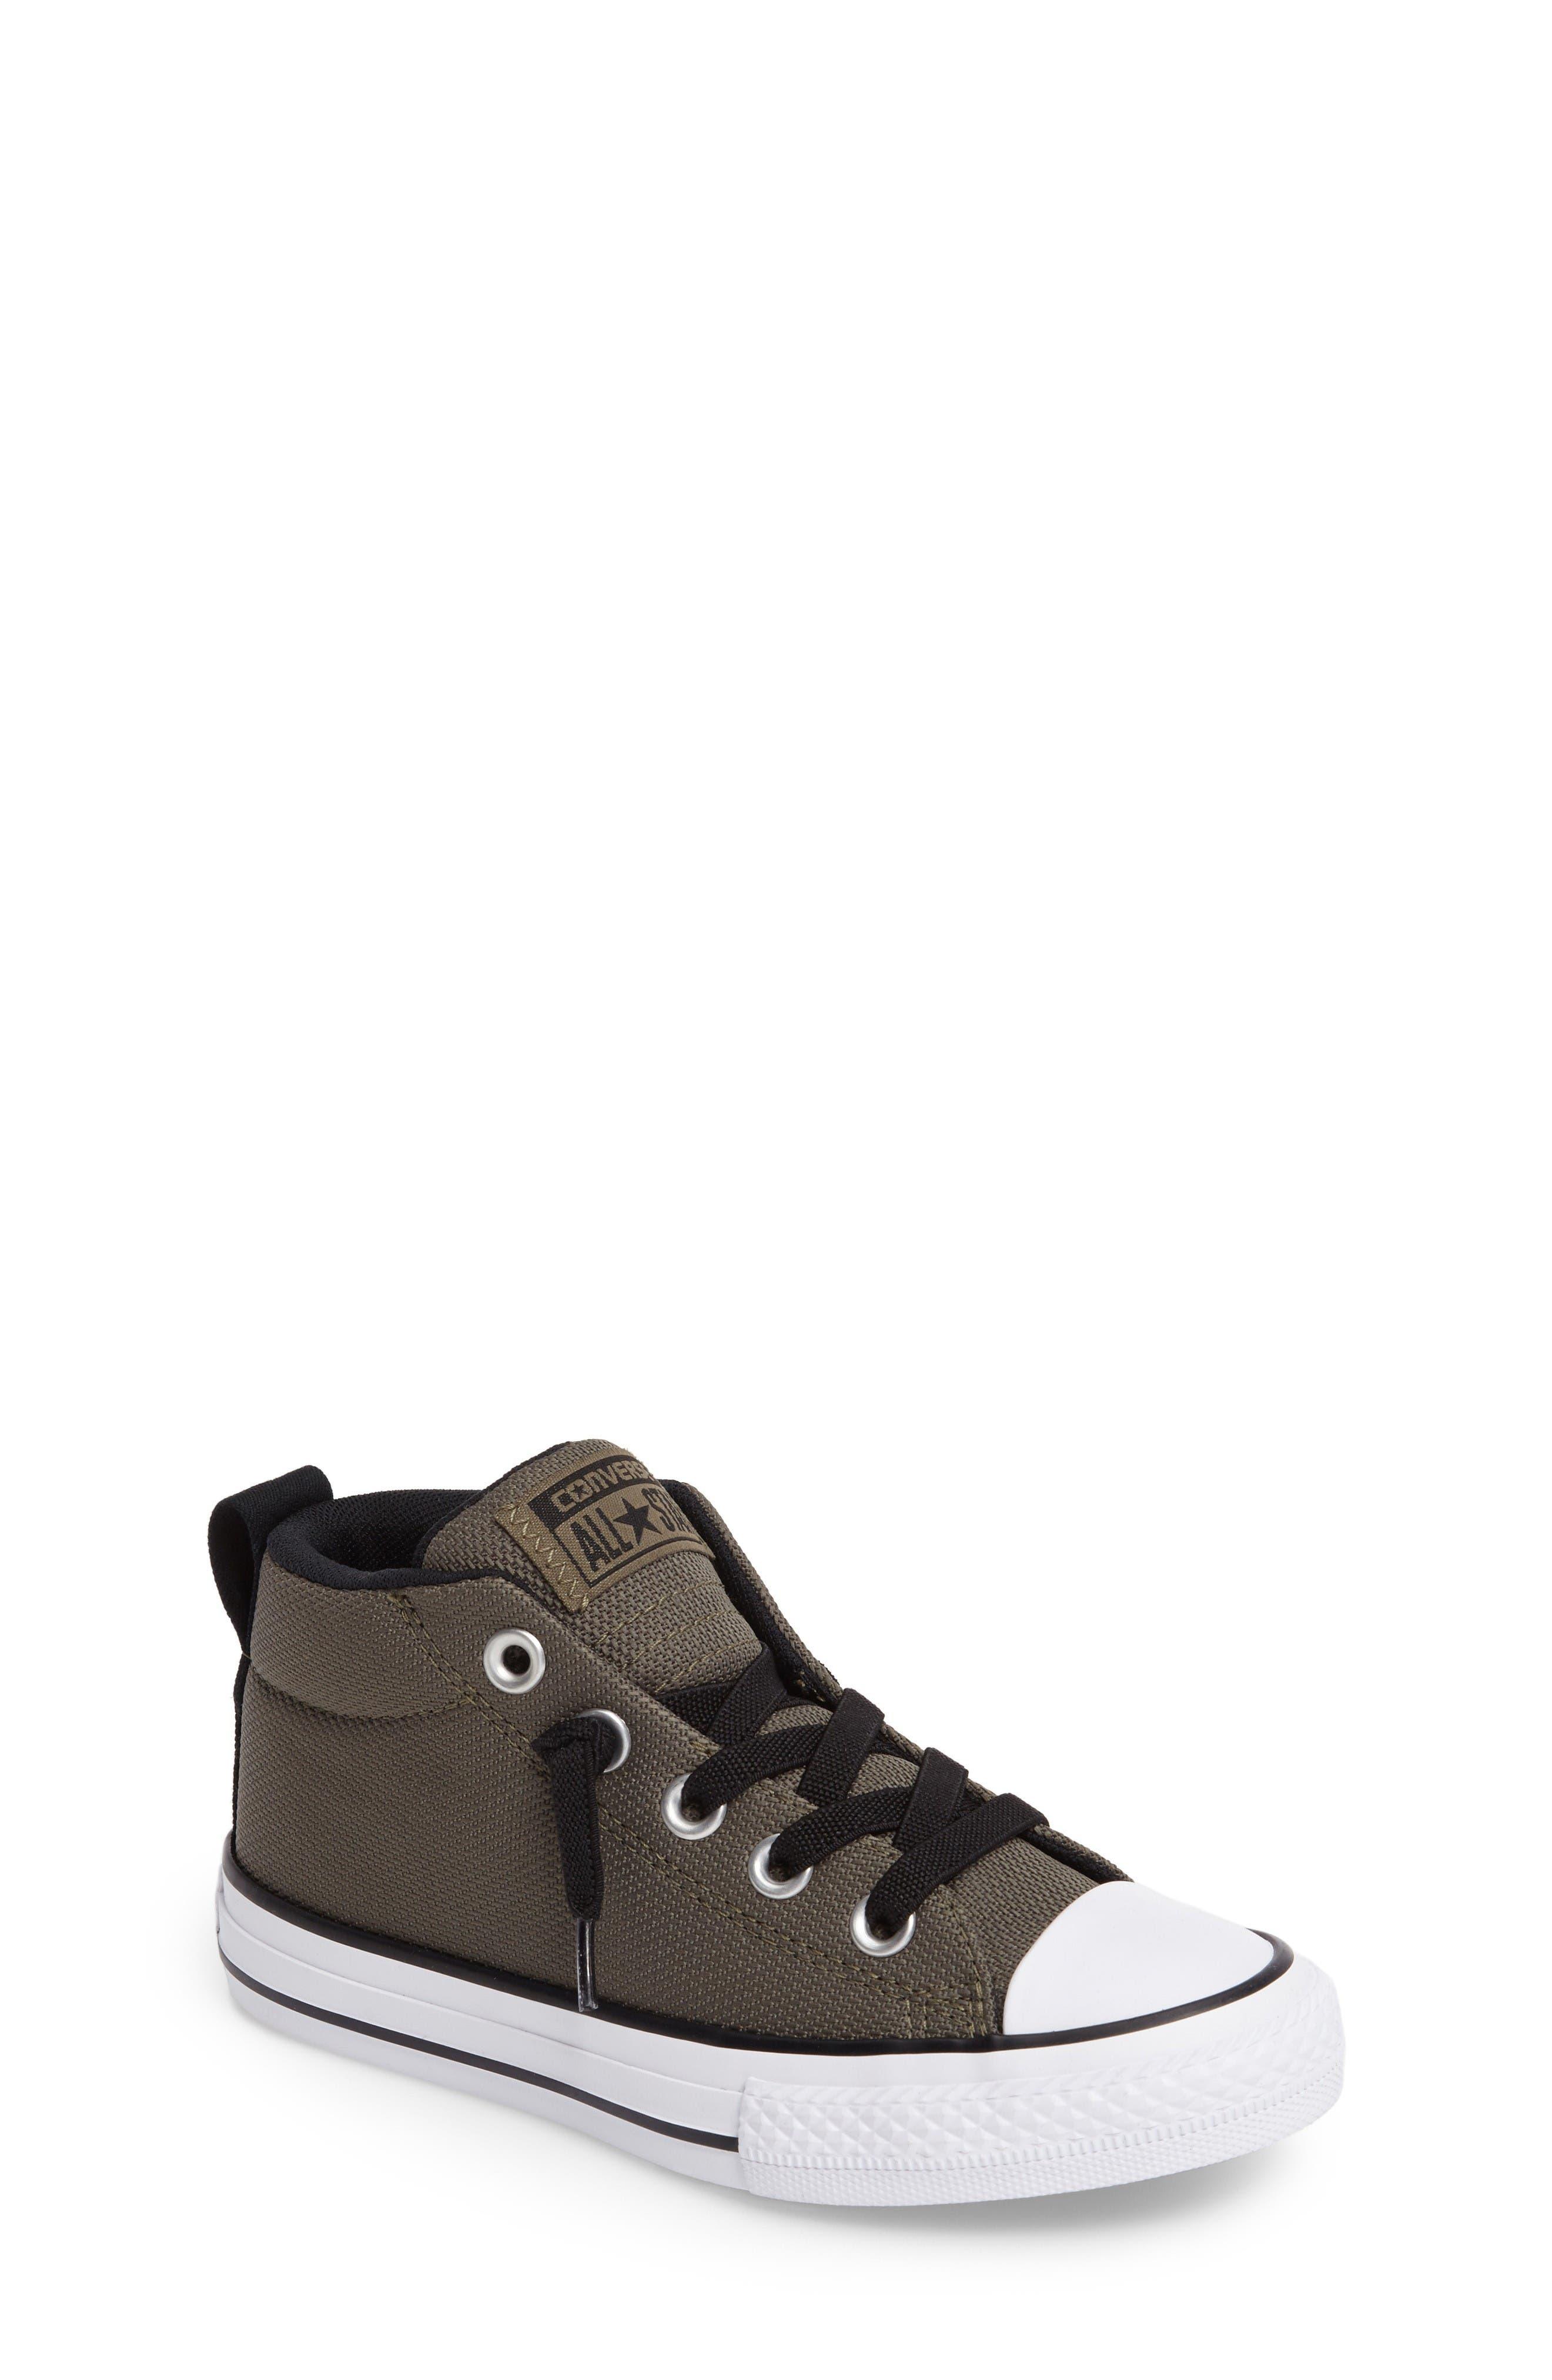 Alternate Image 1 Selected - Converse Chuck Taylor® All Star® Basket Weave Street Mid Sneaker (Toddler, Little Kid & Big Kid)